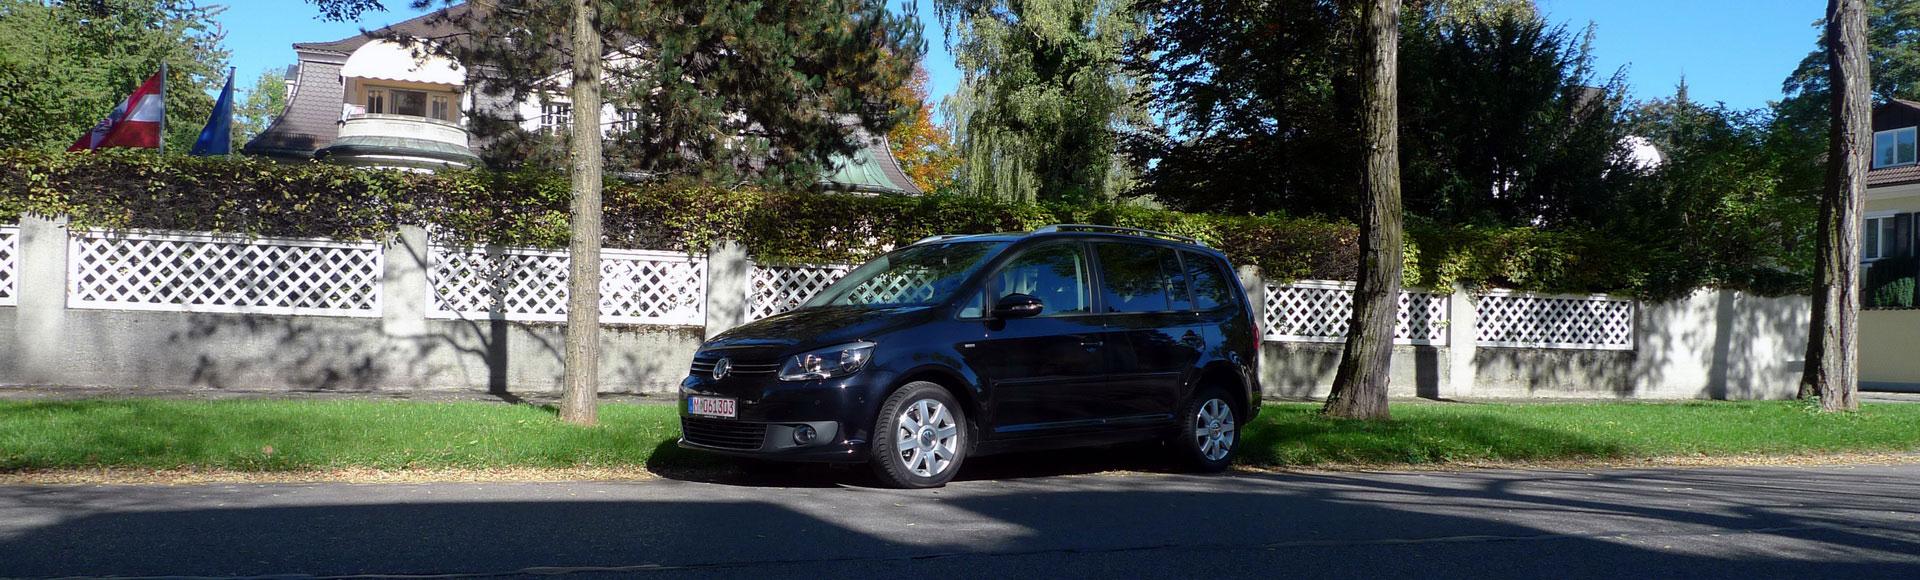 VW Touran 2014 Herbst 128